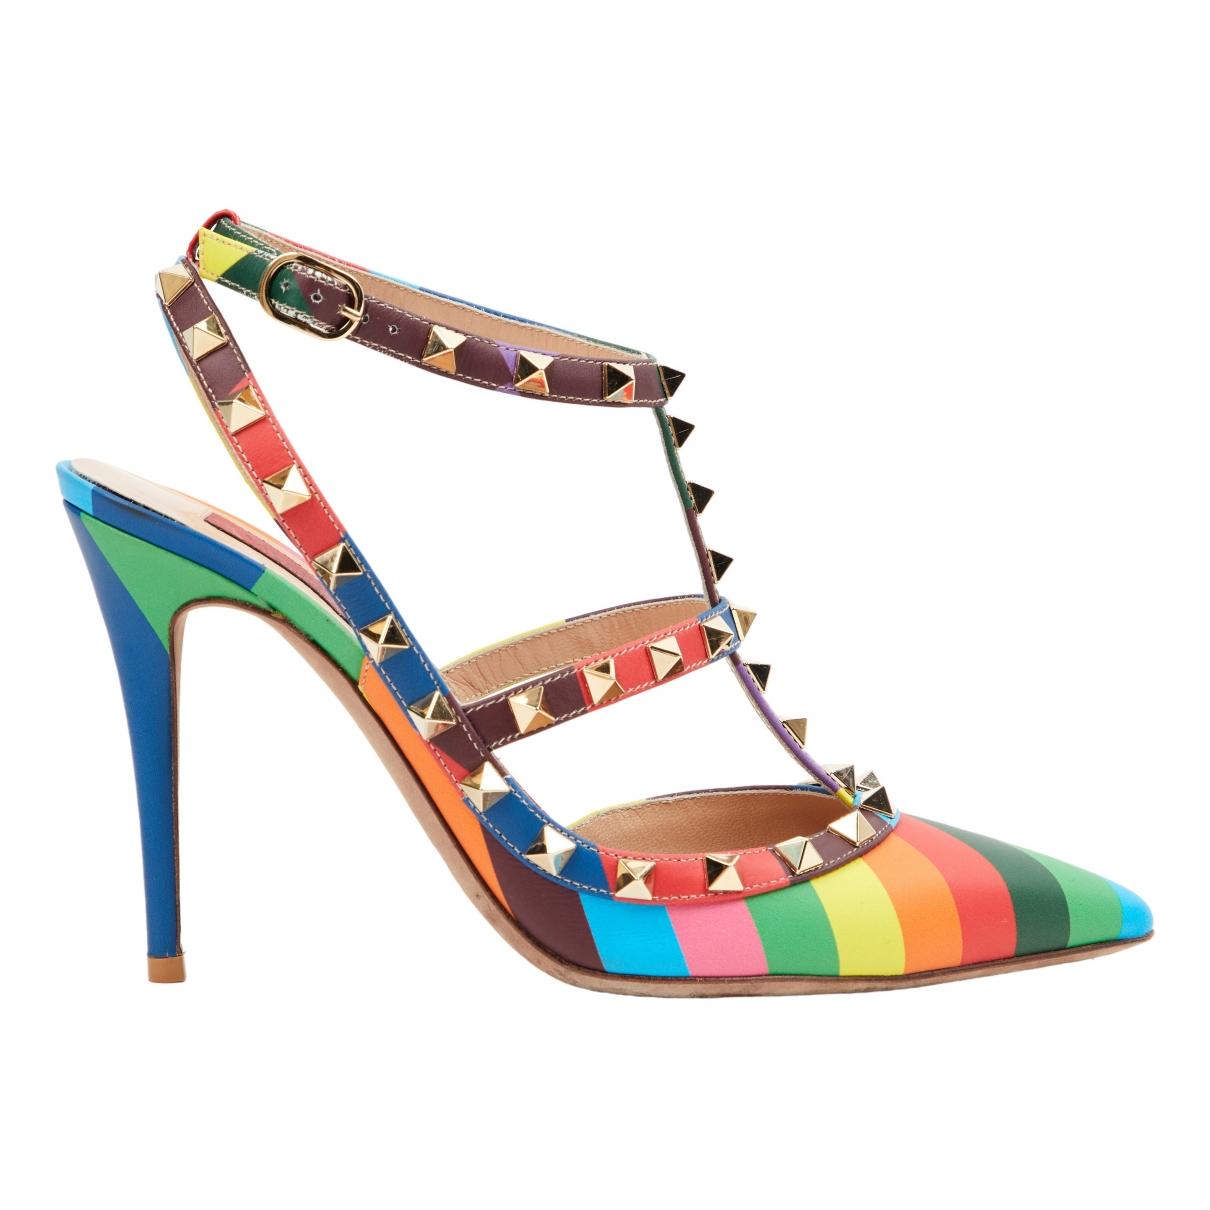 Valentino Garavani Rockstud Multicolour Leather Heels for Women 38.5 IT